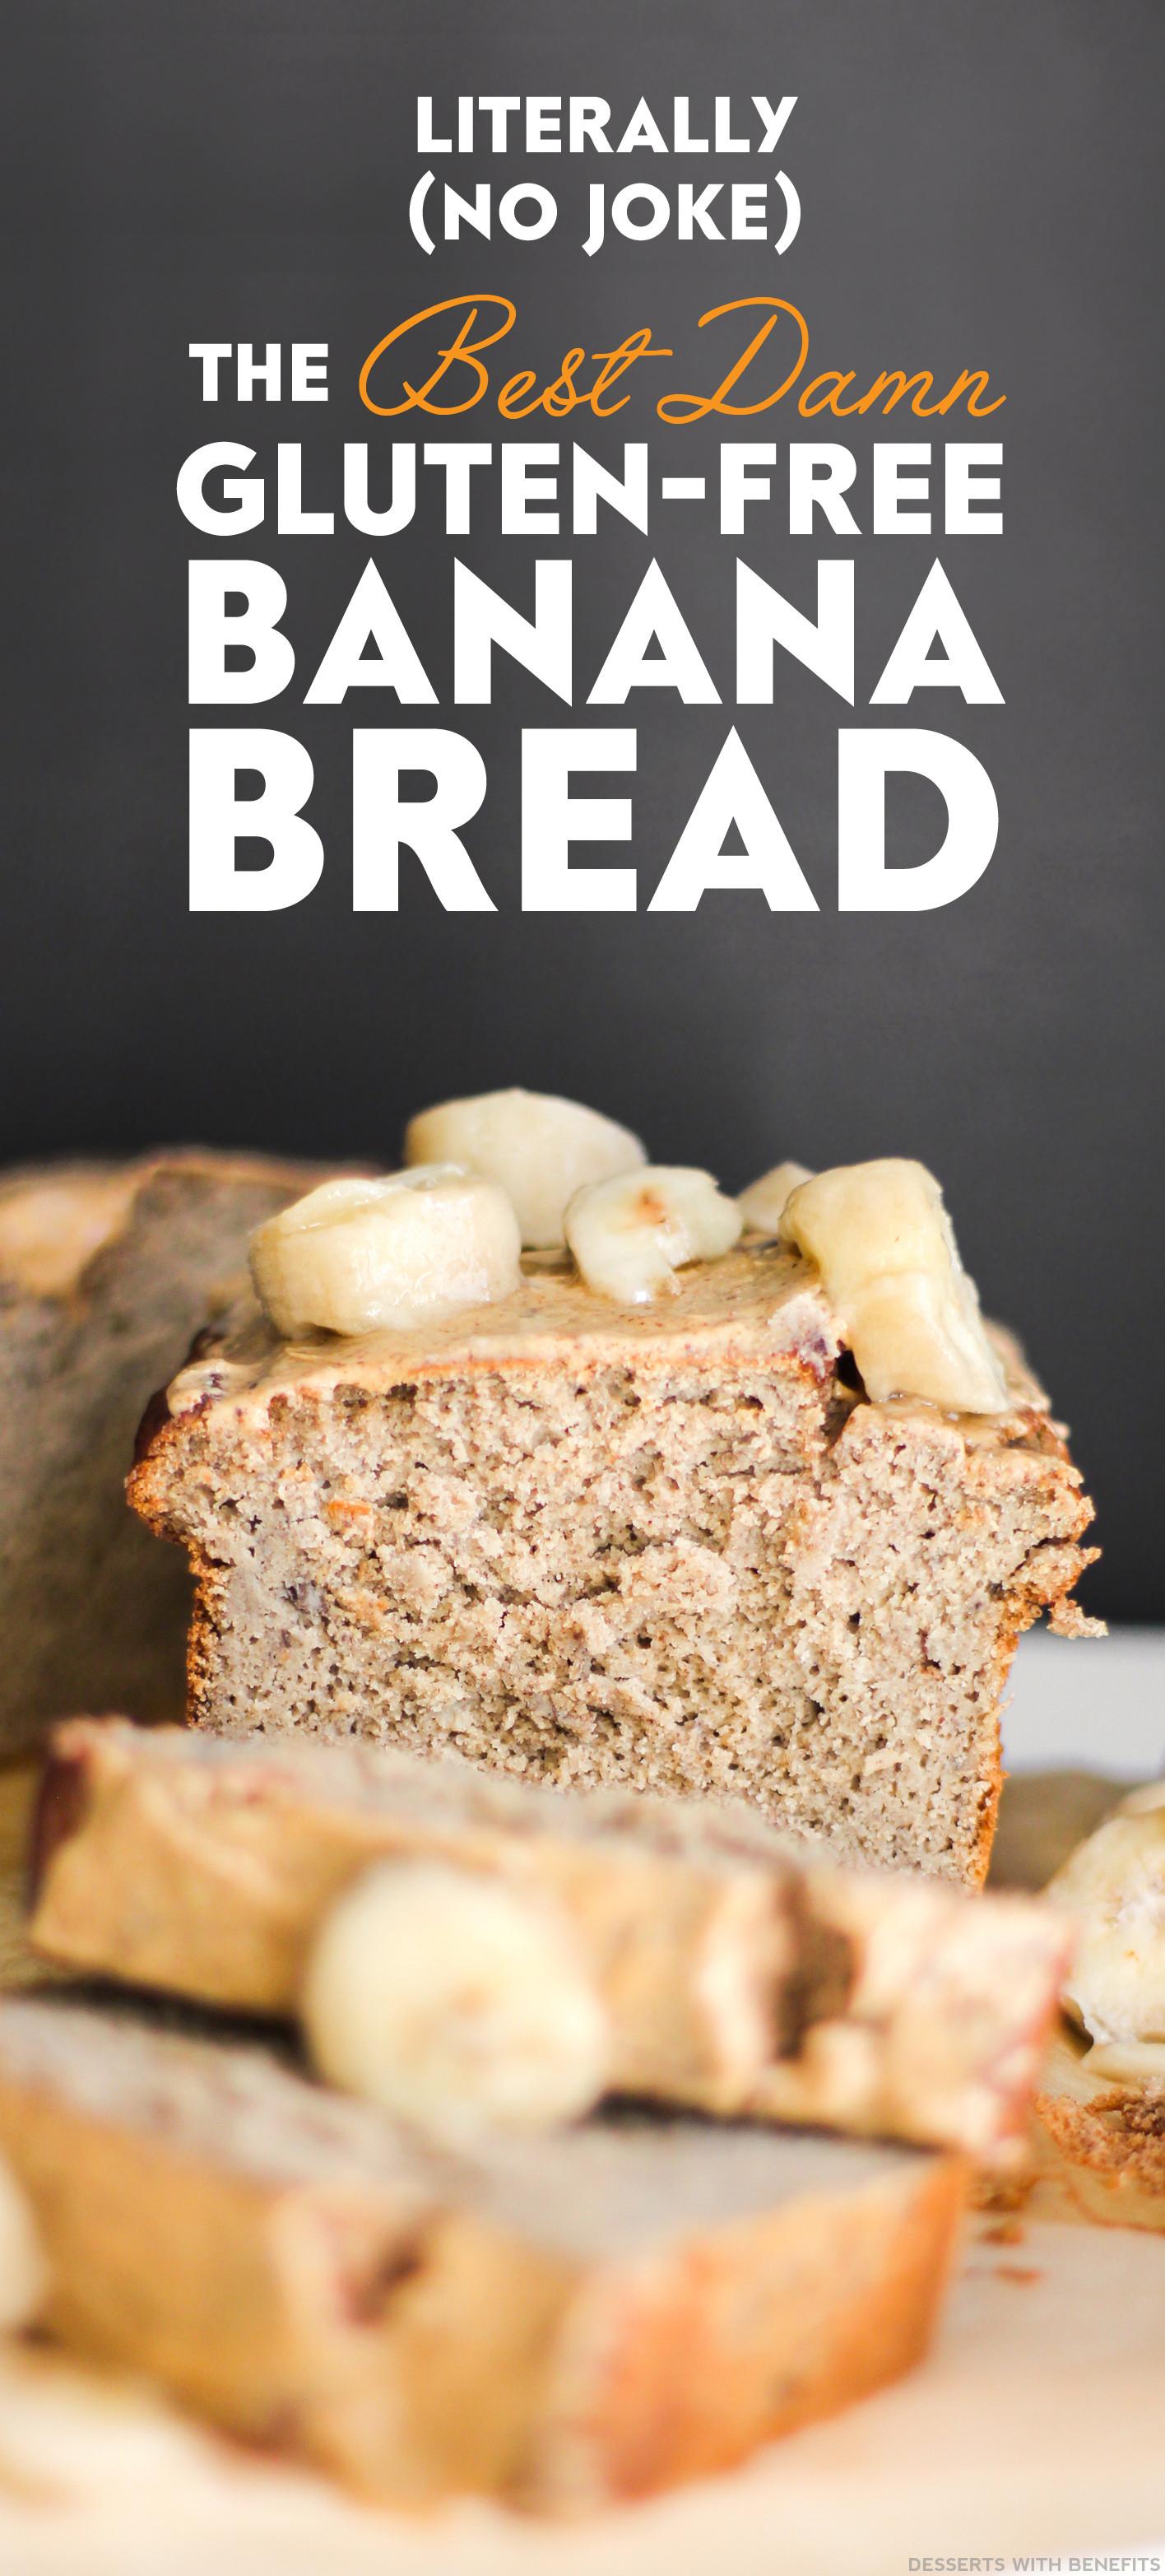 Healthy Gluten Free Bread Recipes  Desserts With Benefits Healthy Banana Bread refined sugar